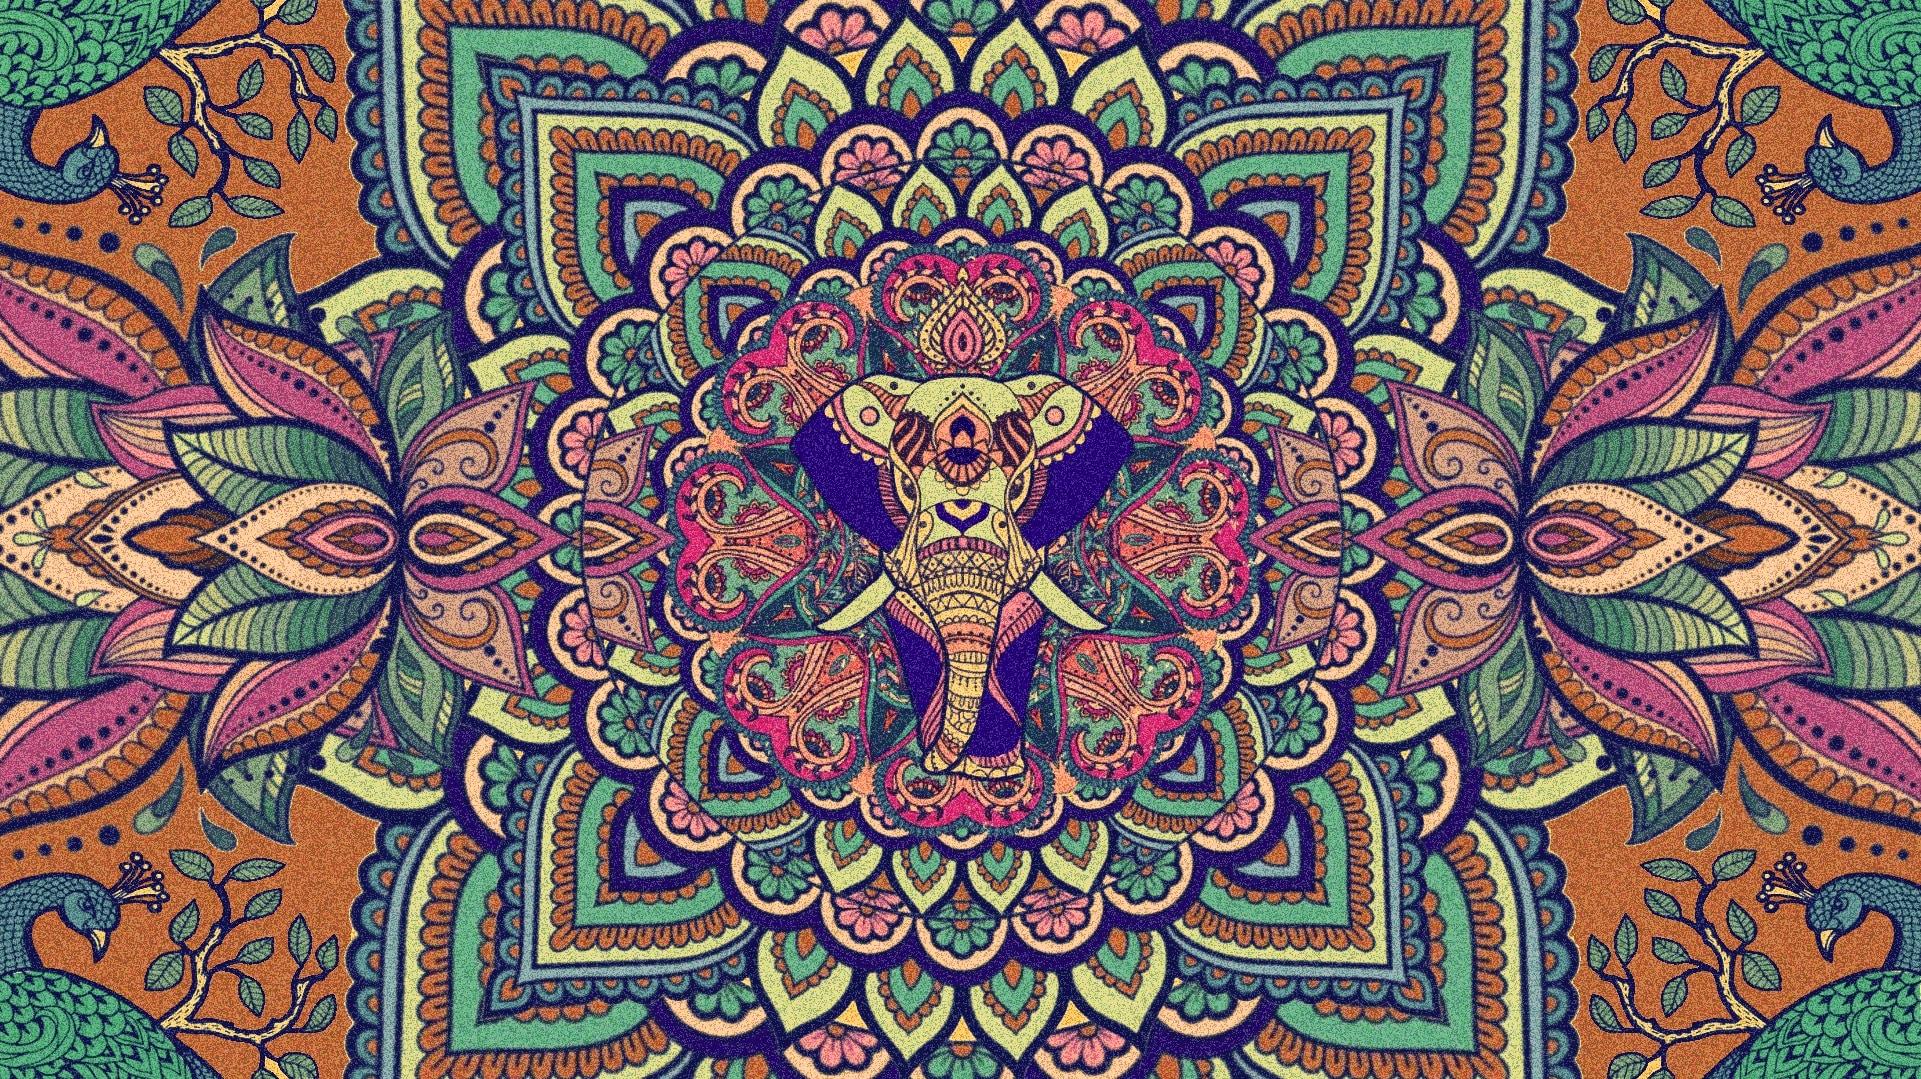 PeacockGanesha